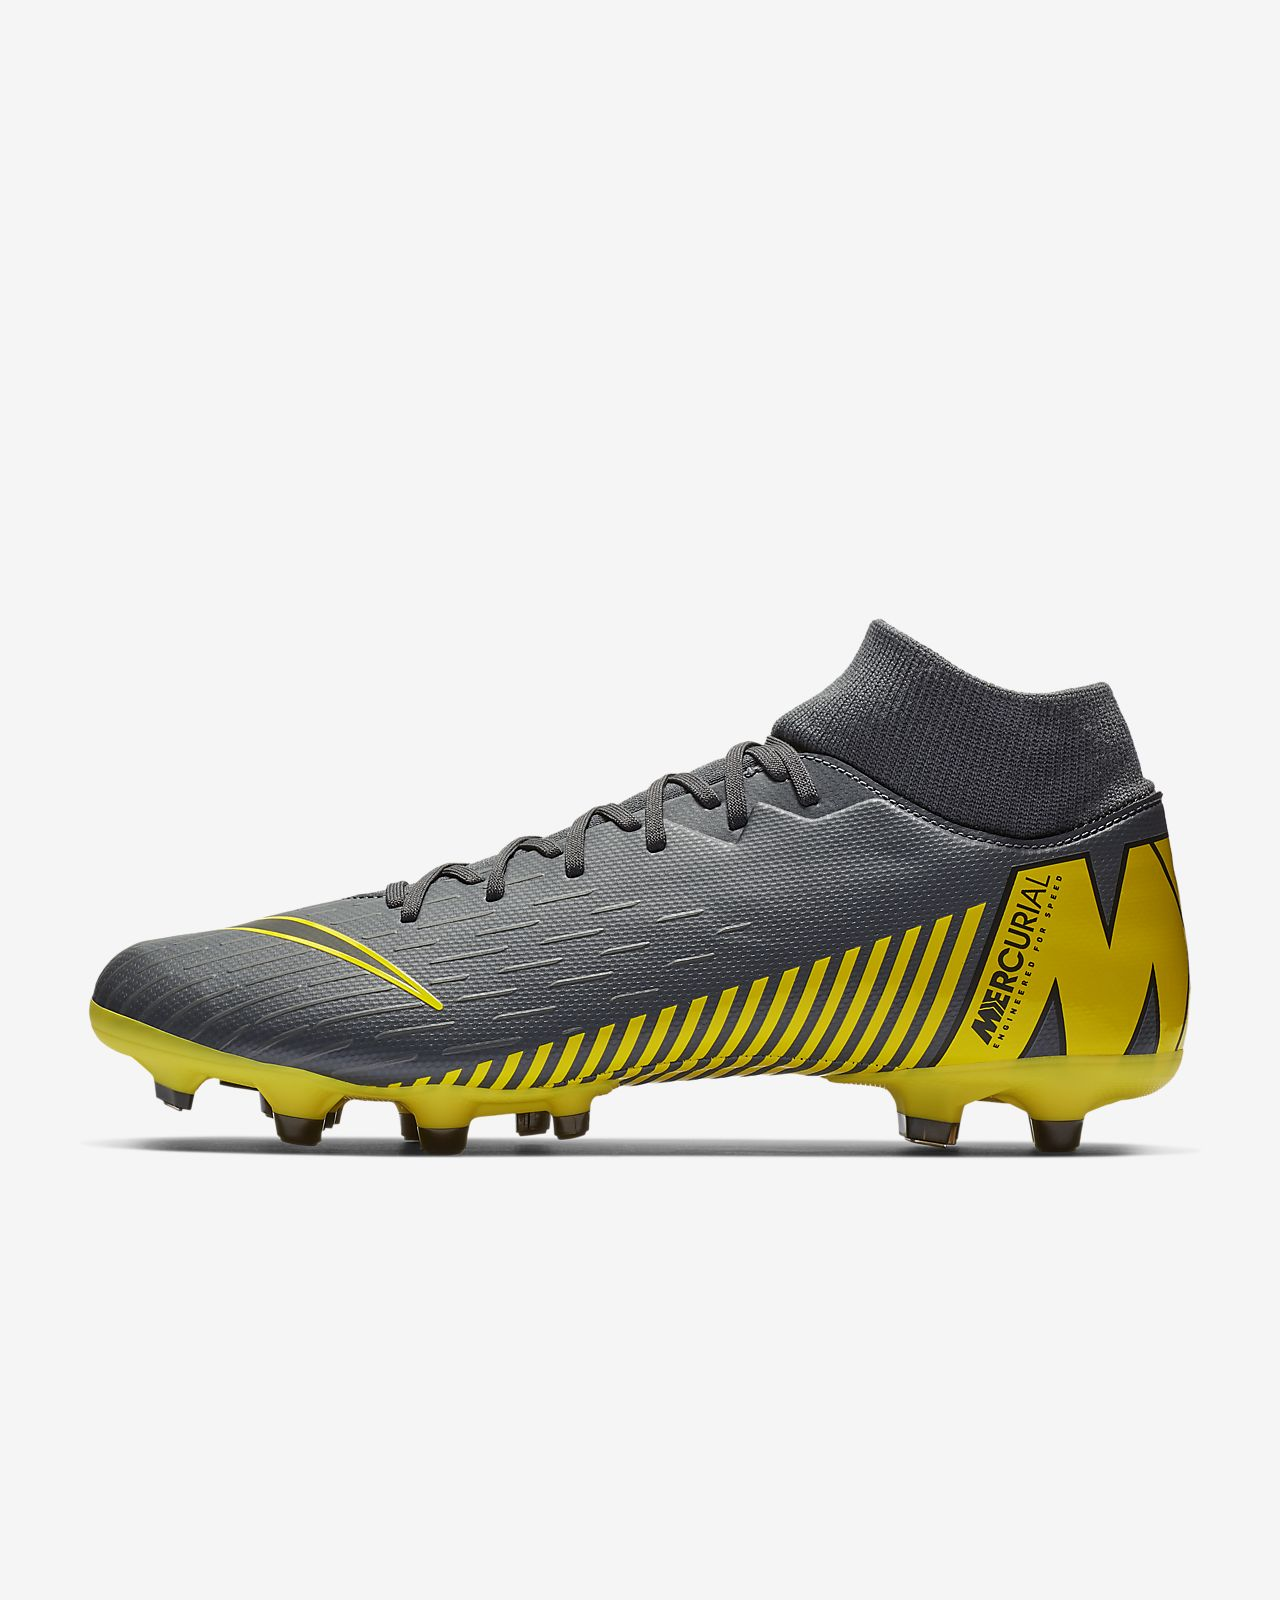 Futbol Tixnrrw Zapatos Nike Diseñar De d1Iqtt